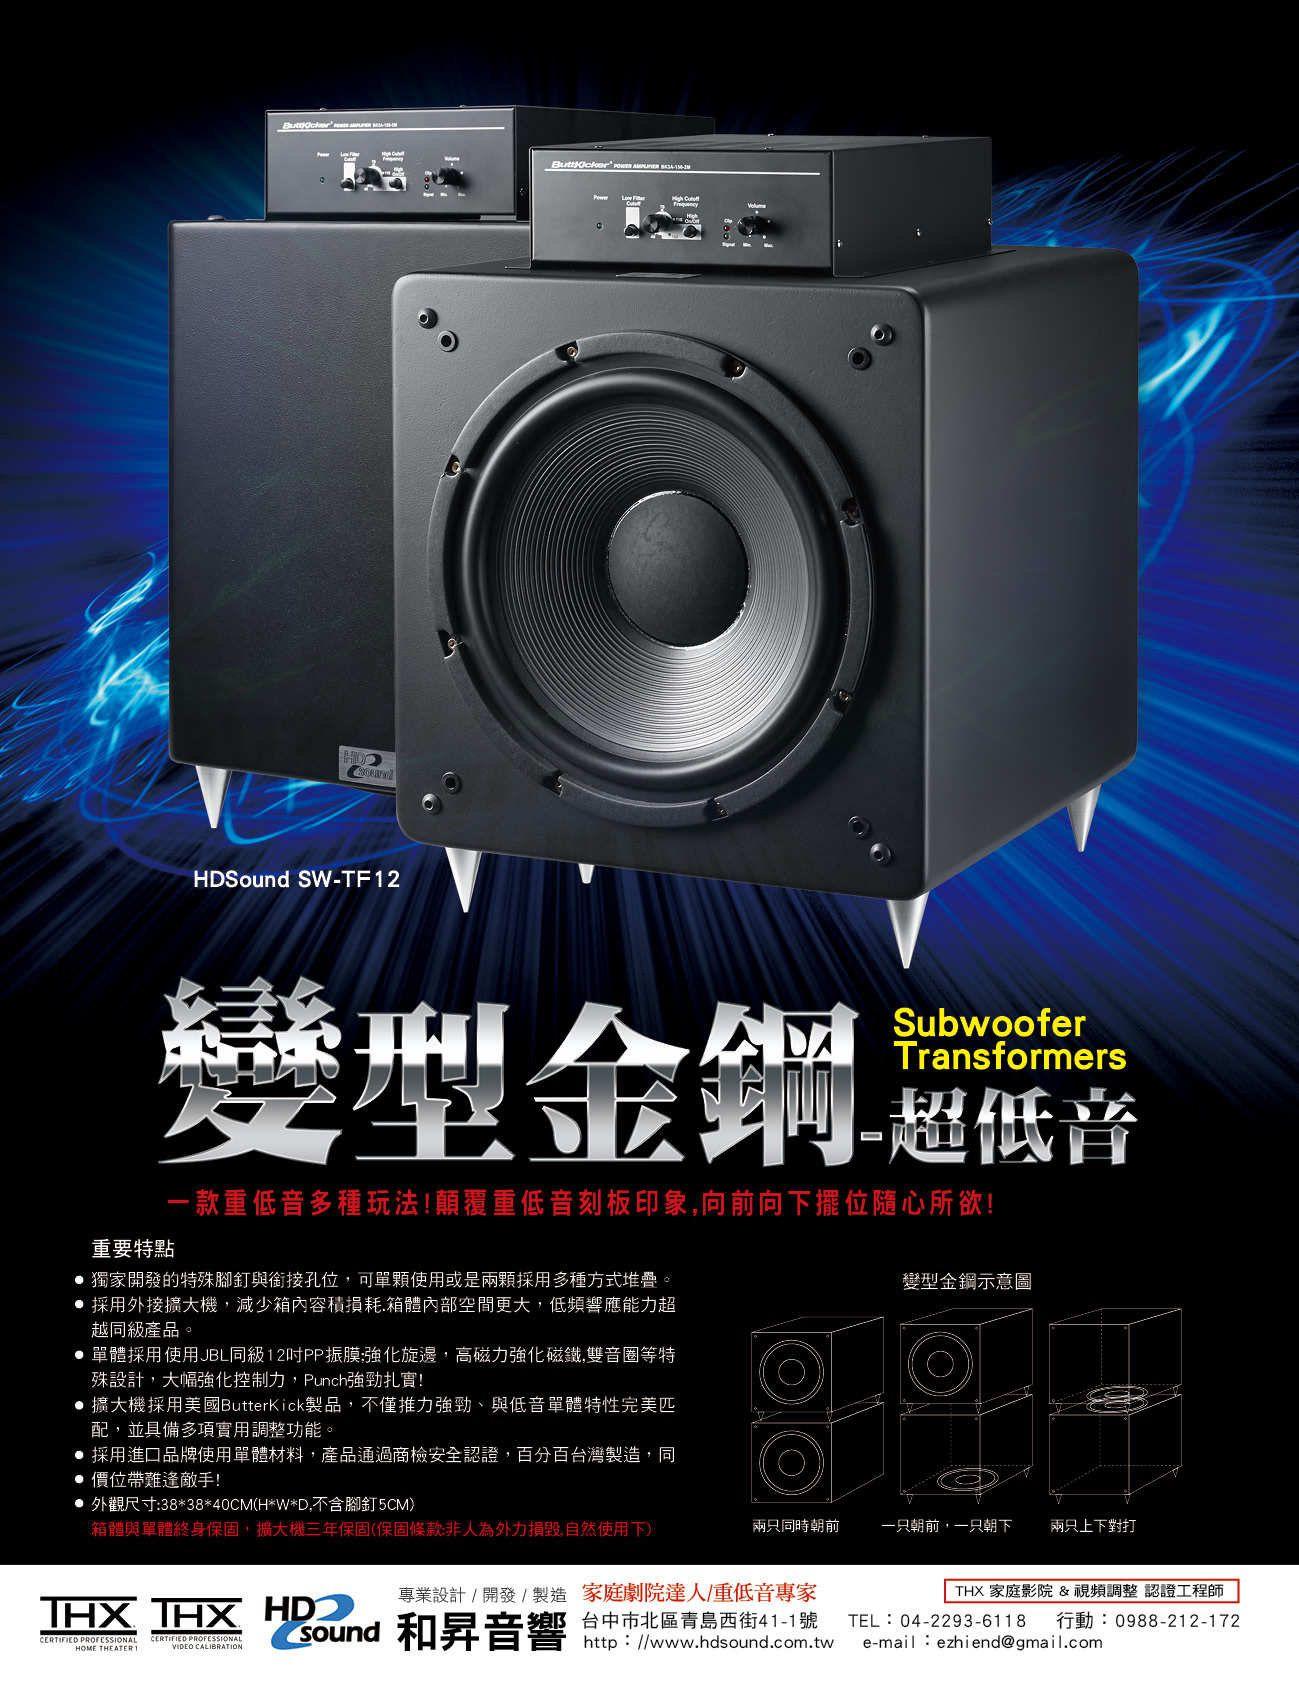 PChome Online 商店街 - 和昇音響 - HD SOUND - - 2014年式 HDSound SW-TF12 變形金剛重低音